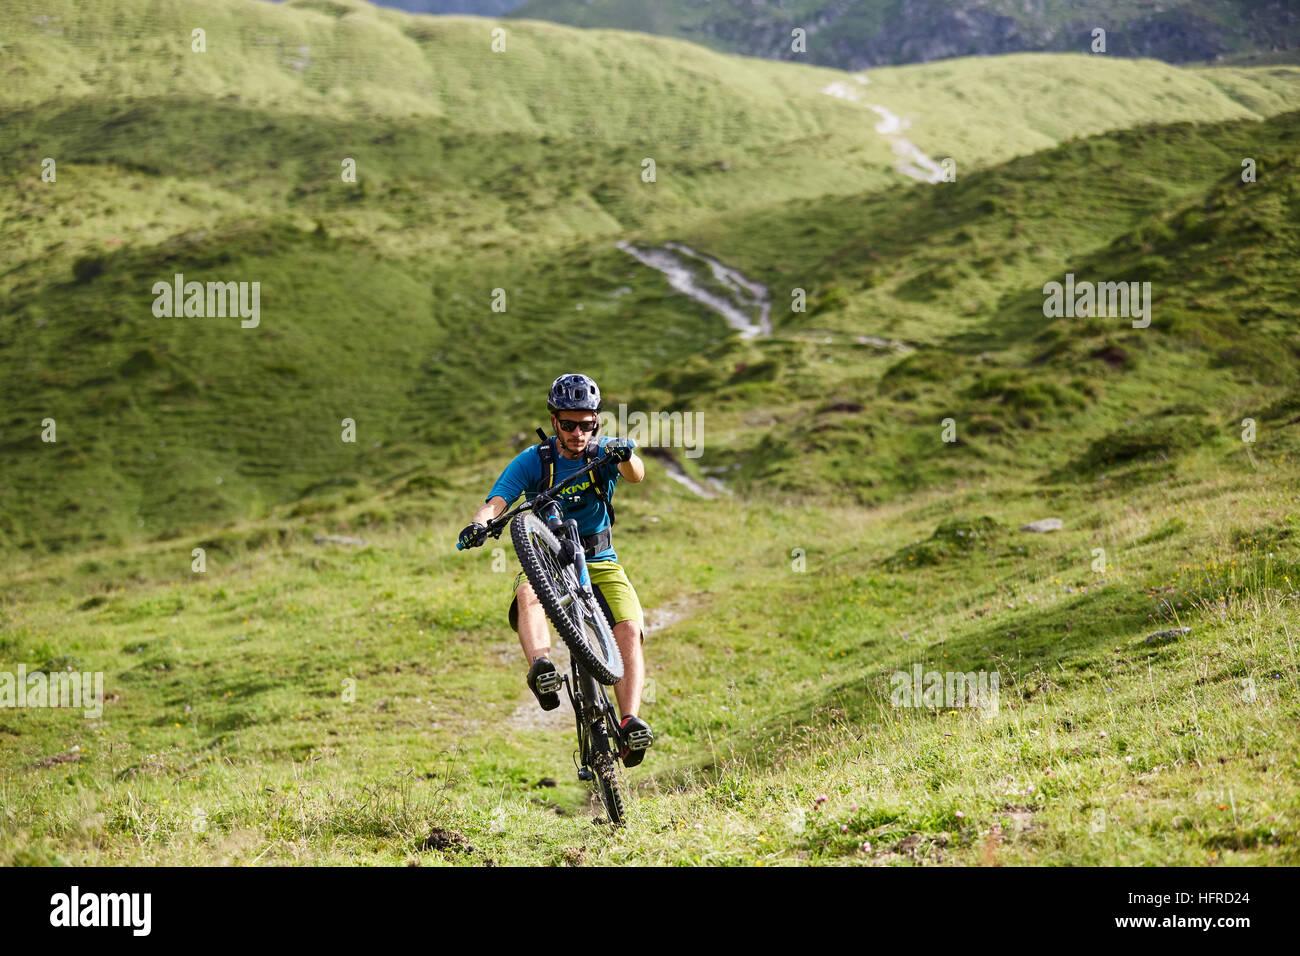 Mountain Biker rides a trail in the hilly landscape, Kalkkögel, Tyrol, Austria - Stock Image